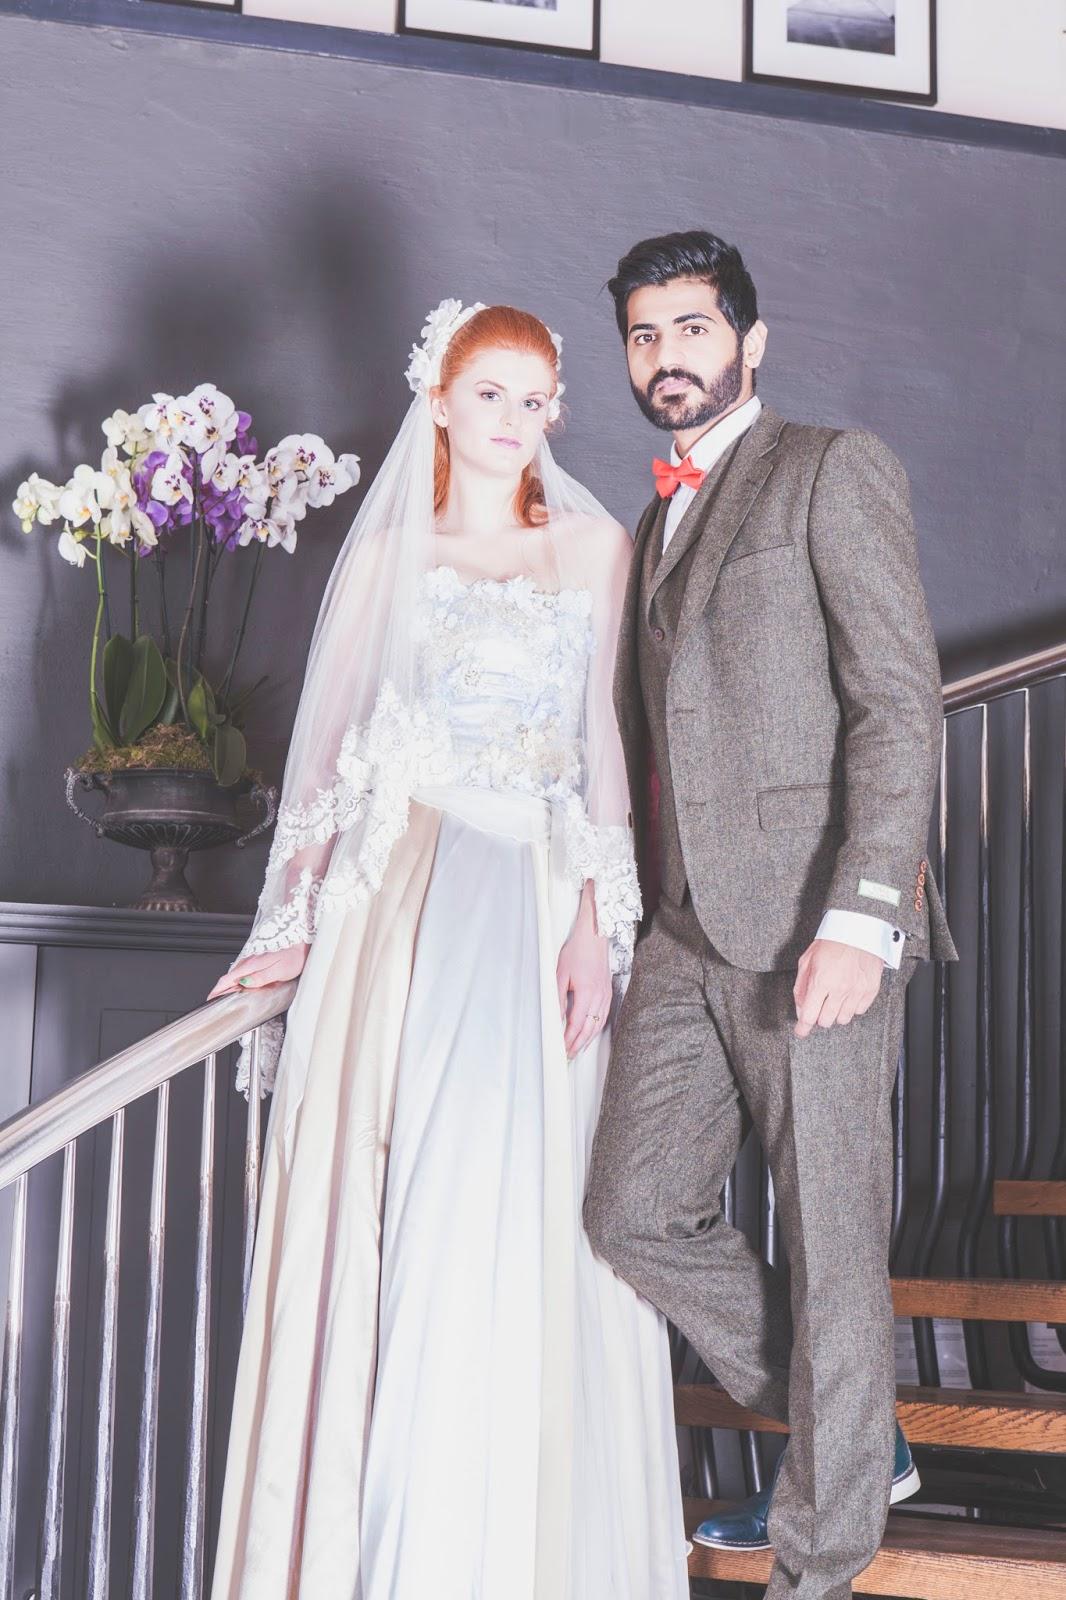 Bristol Vintage Wedding Fair: HOTEL DU VIN WEDDING SHOOT